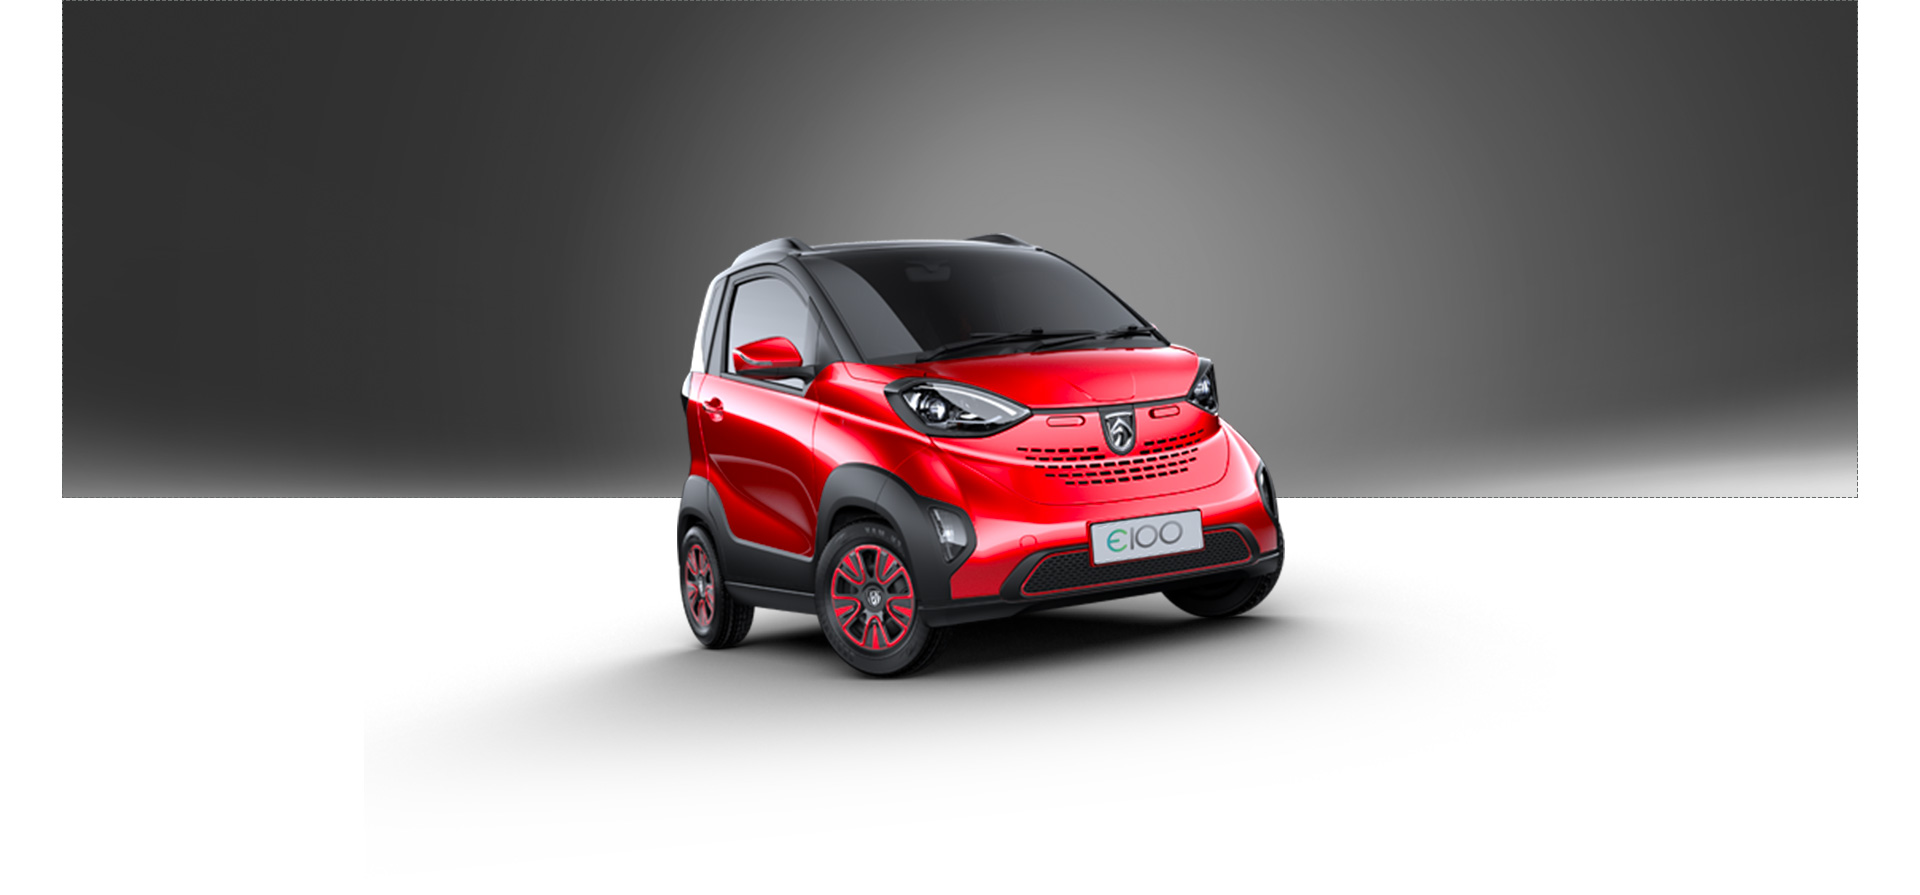 寶(bao)駿E100,電動(dong)汽(qi)車,新能源(yuan)車,外觀,顏色,圖片